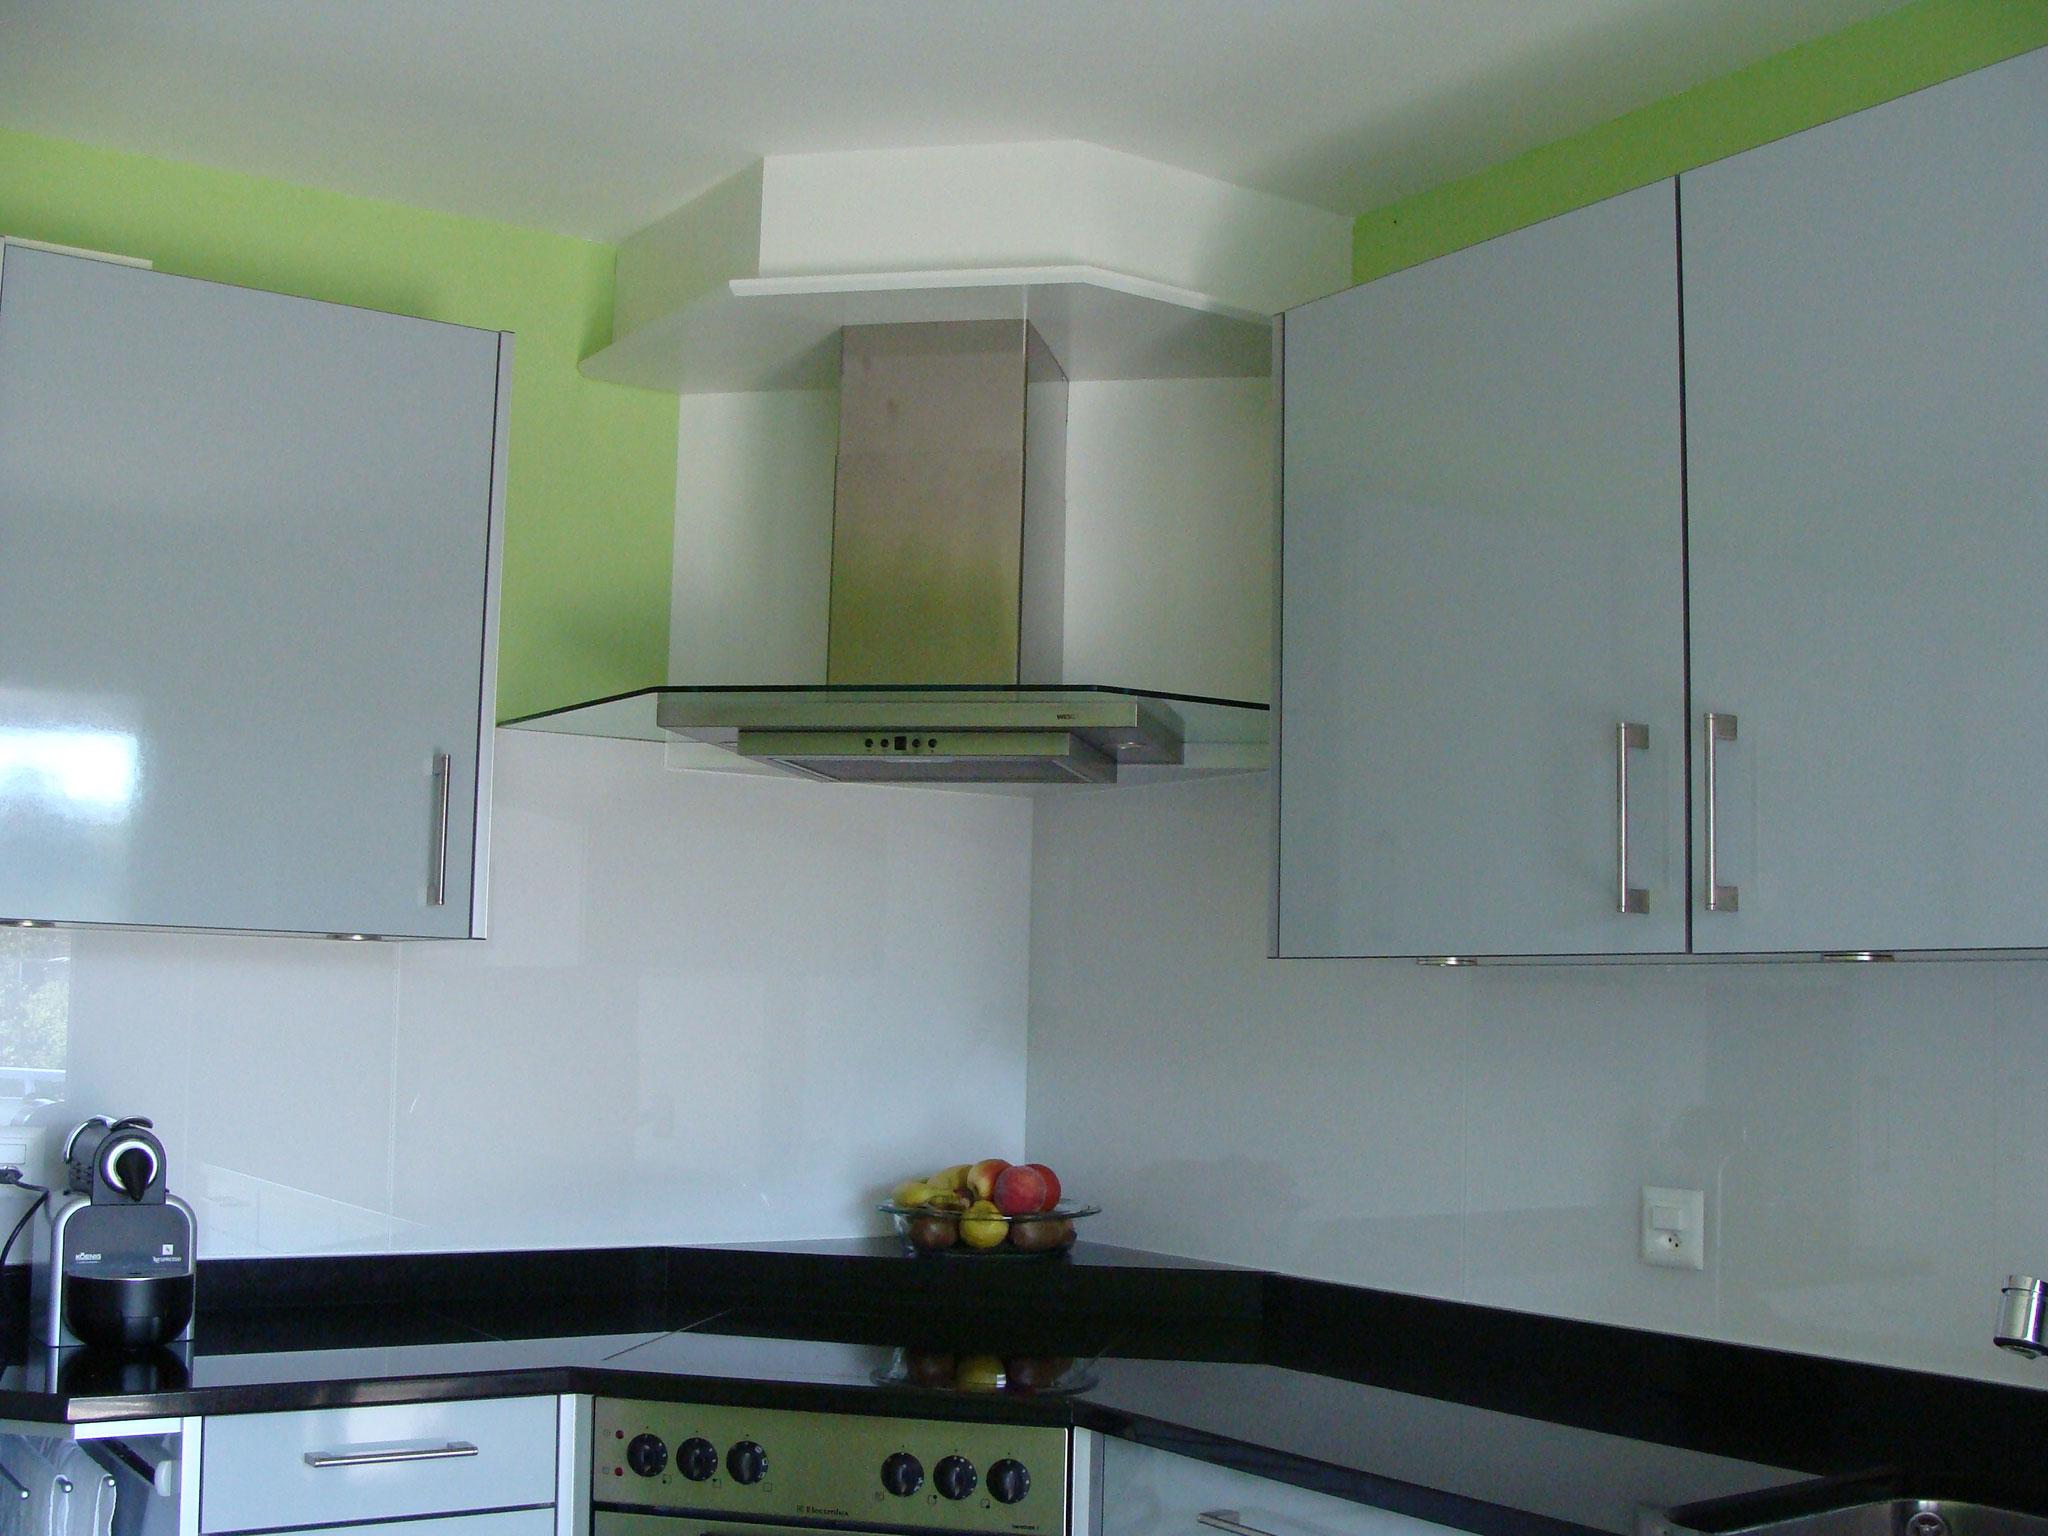 sweet home freut sich ber kreativen leser input sweet home. Black Bedroom Furniture Sets. Home Design Ideas